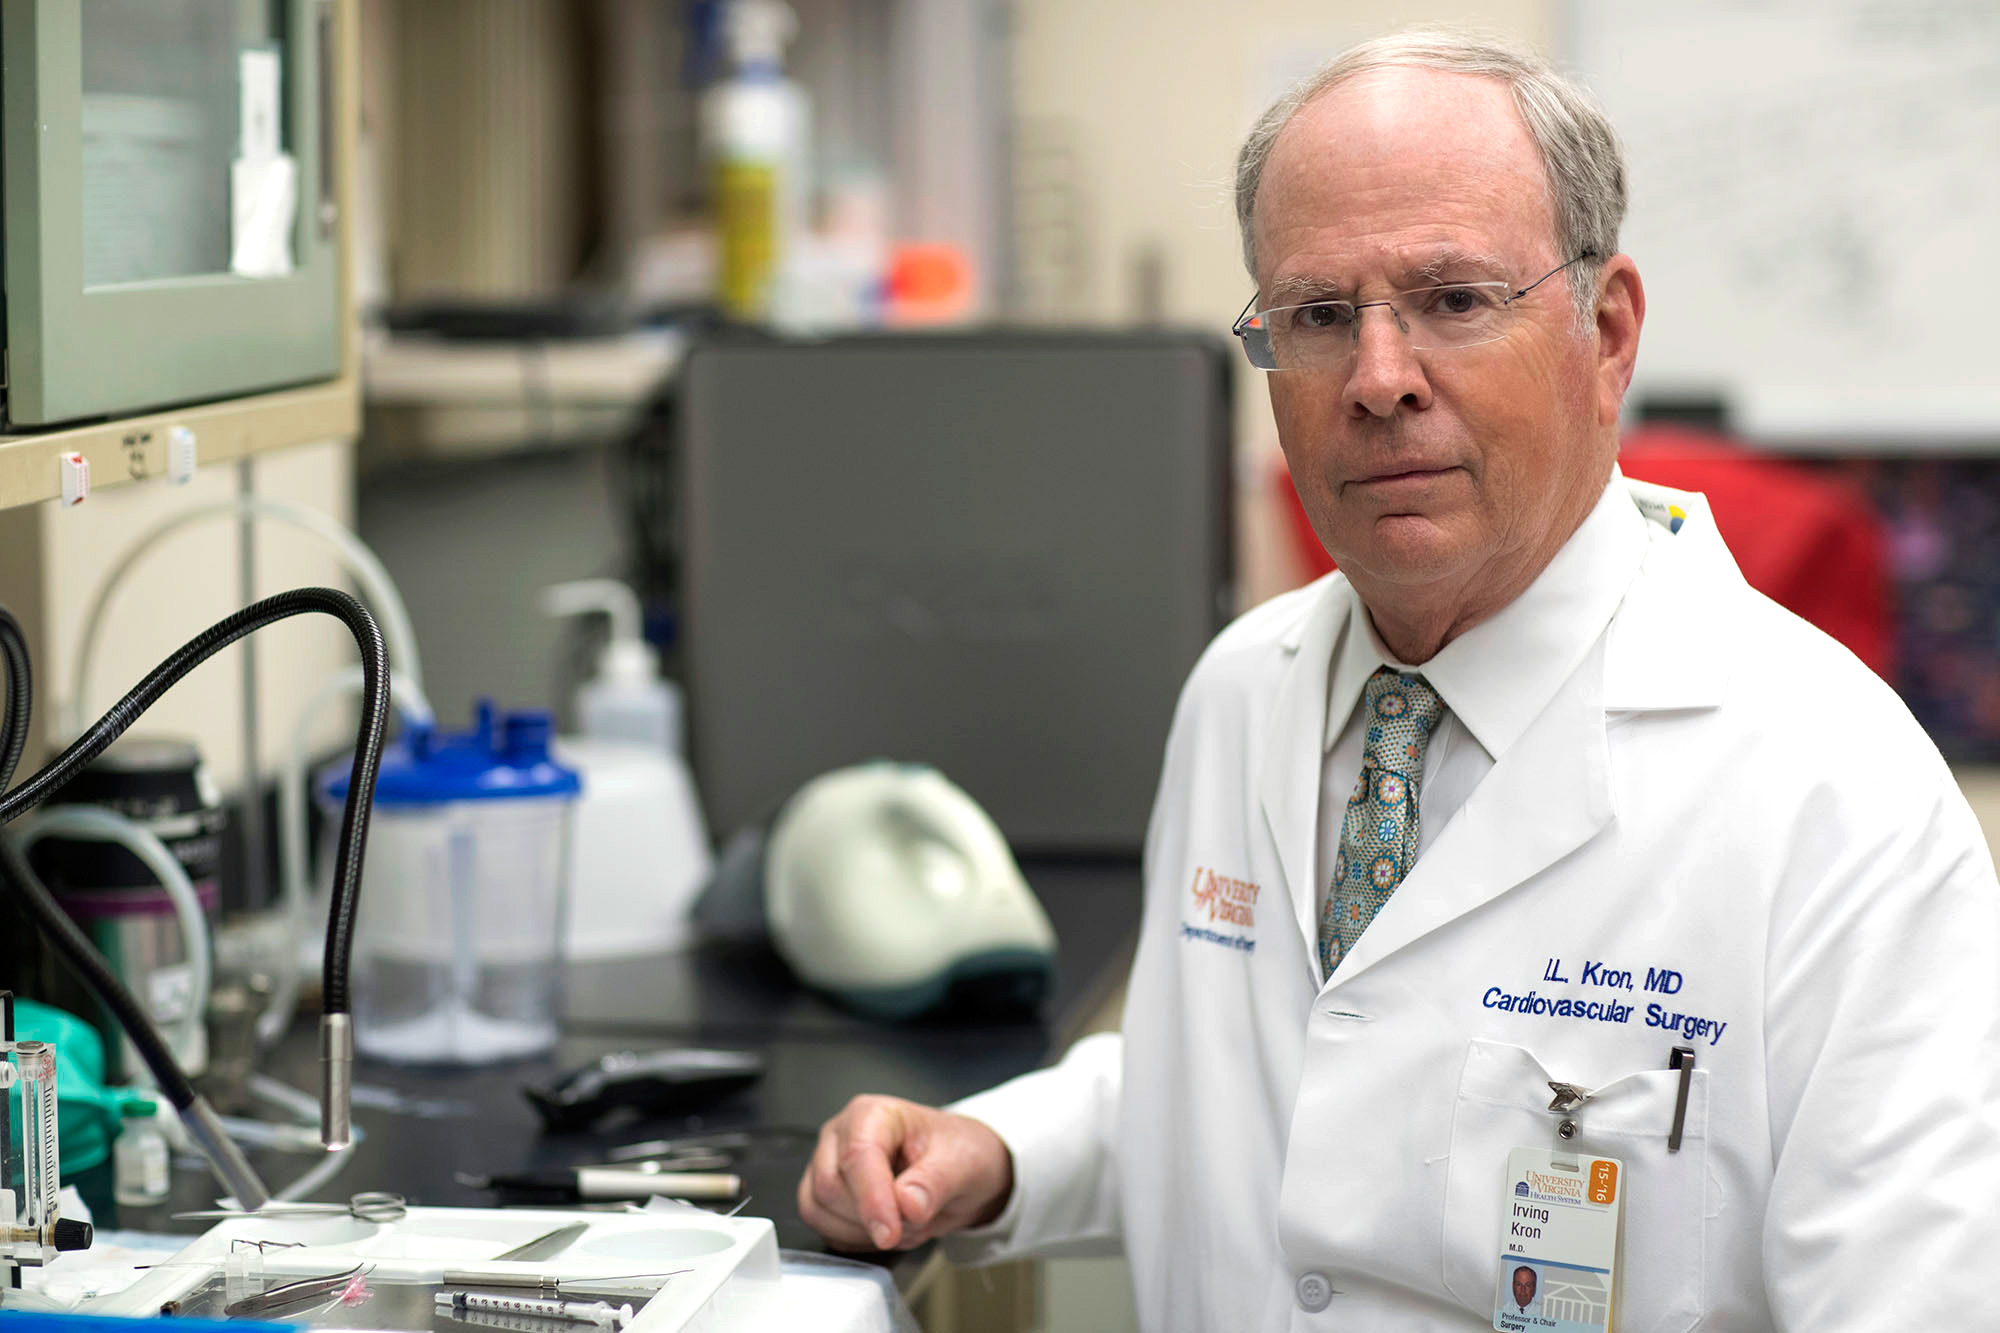 Dr. Irving L. Kron (Photo by Dan Addison, University Communications)